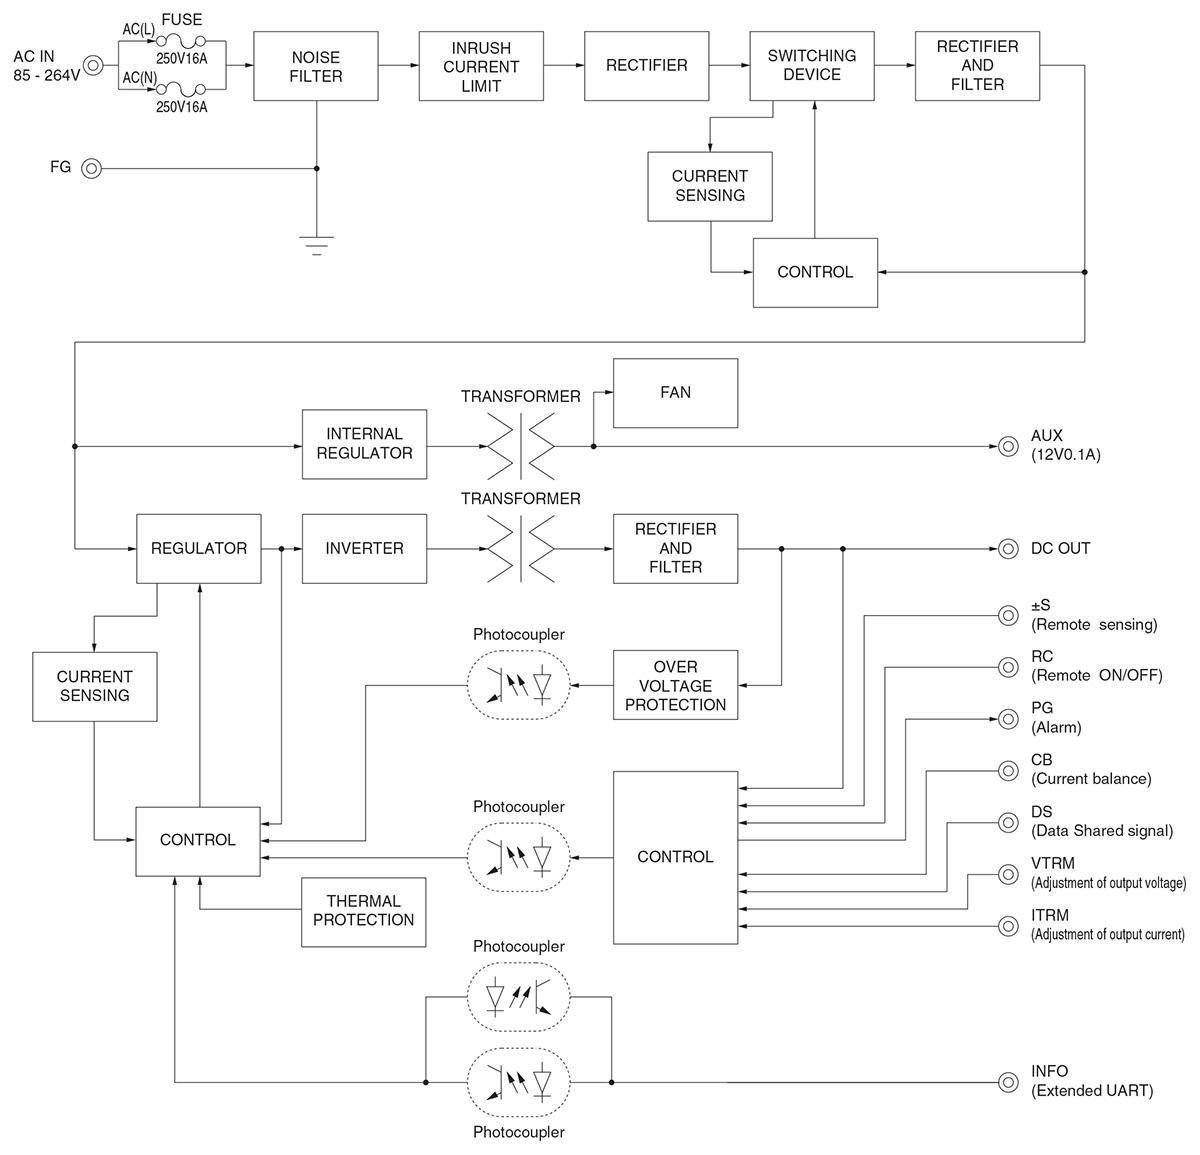 Pca600fproduct Infocosel Co Ltd Parallel Circuit Diagram 4th Grade Block